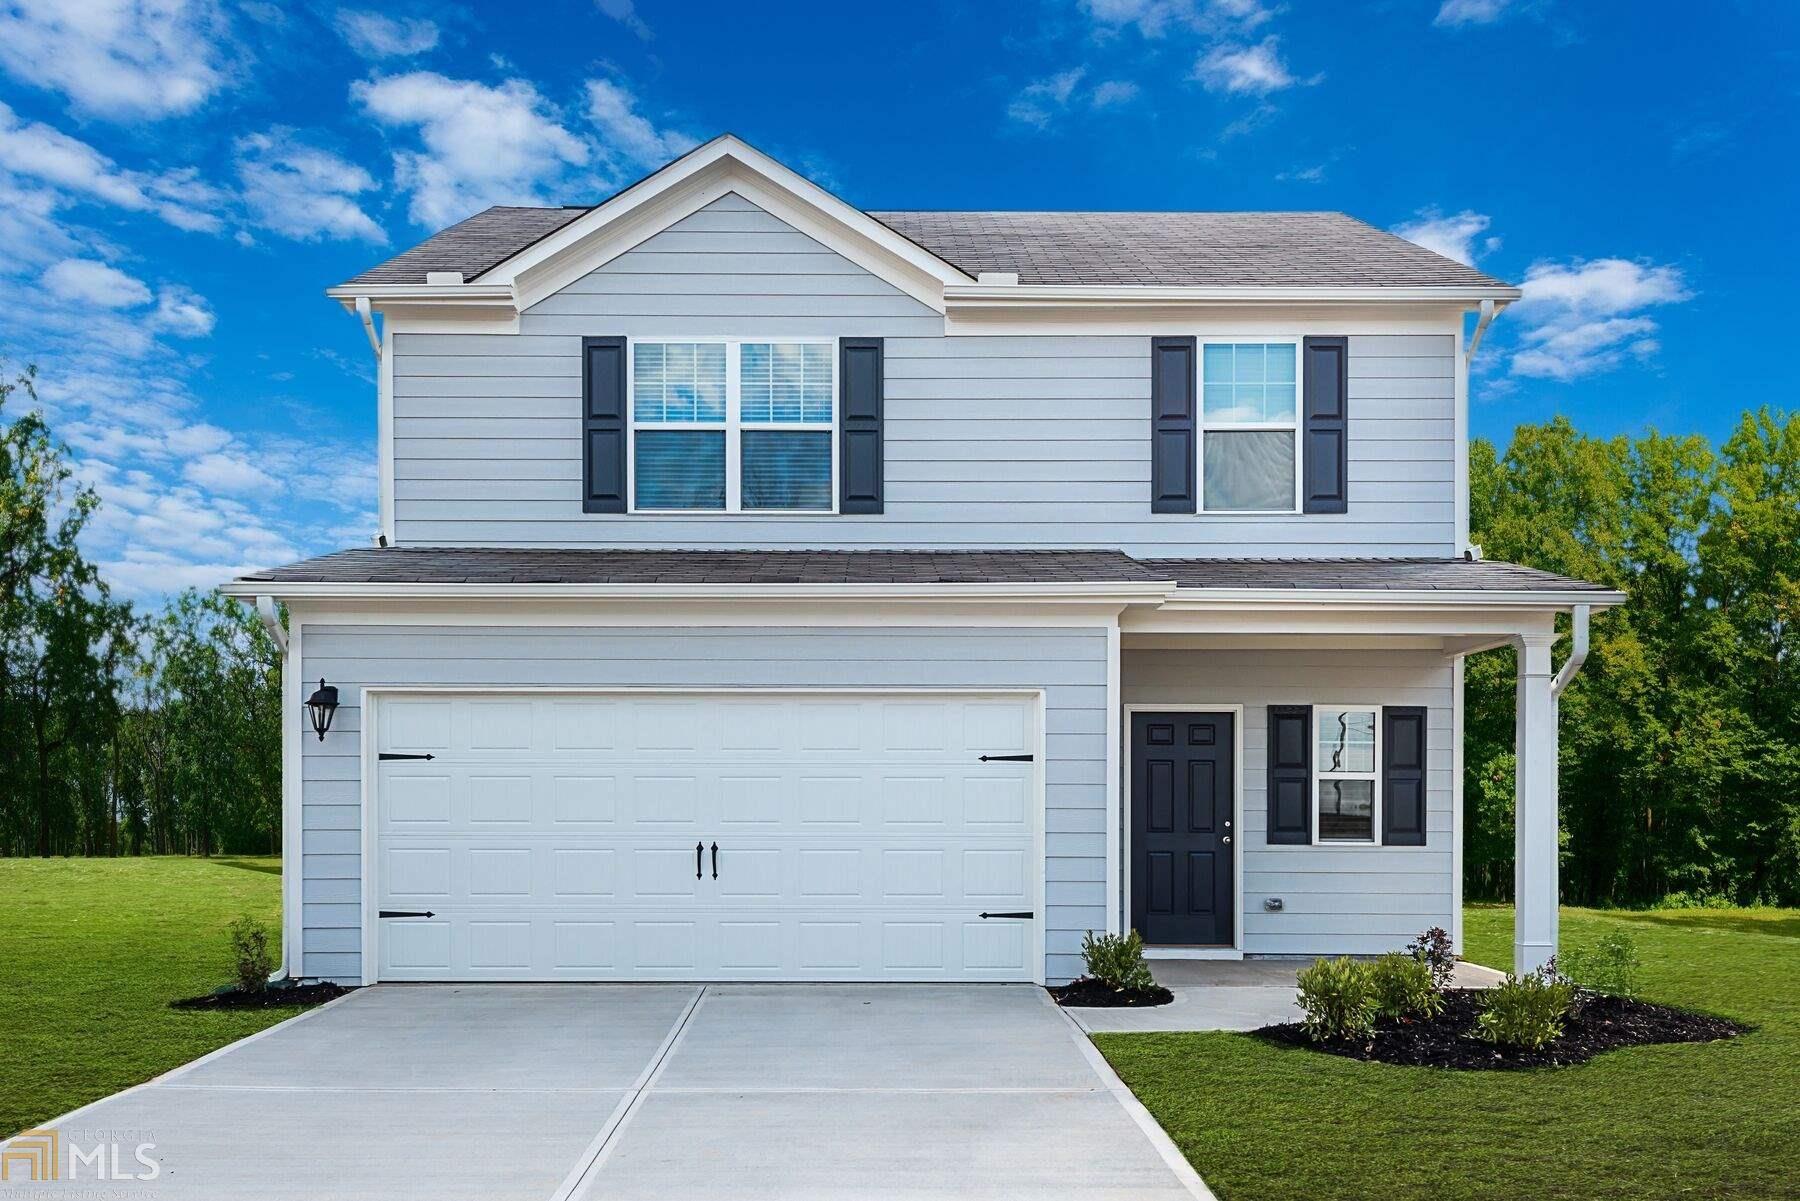 3382 Clawing Hawk Way, Douglasville, GA 30135 - MLS#: 8891945